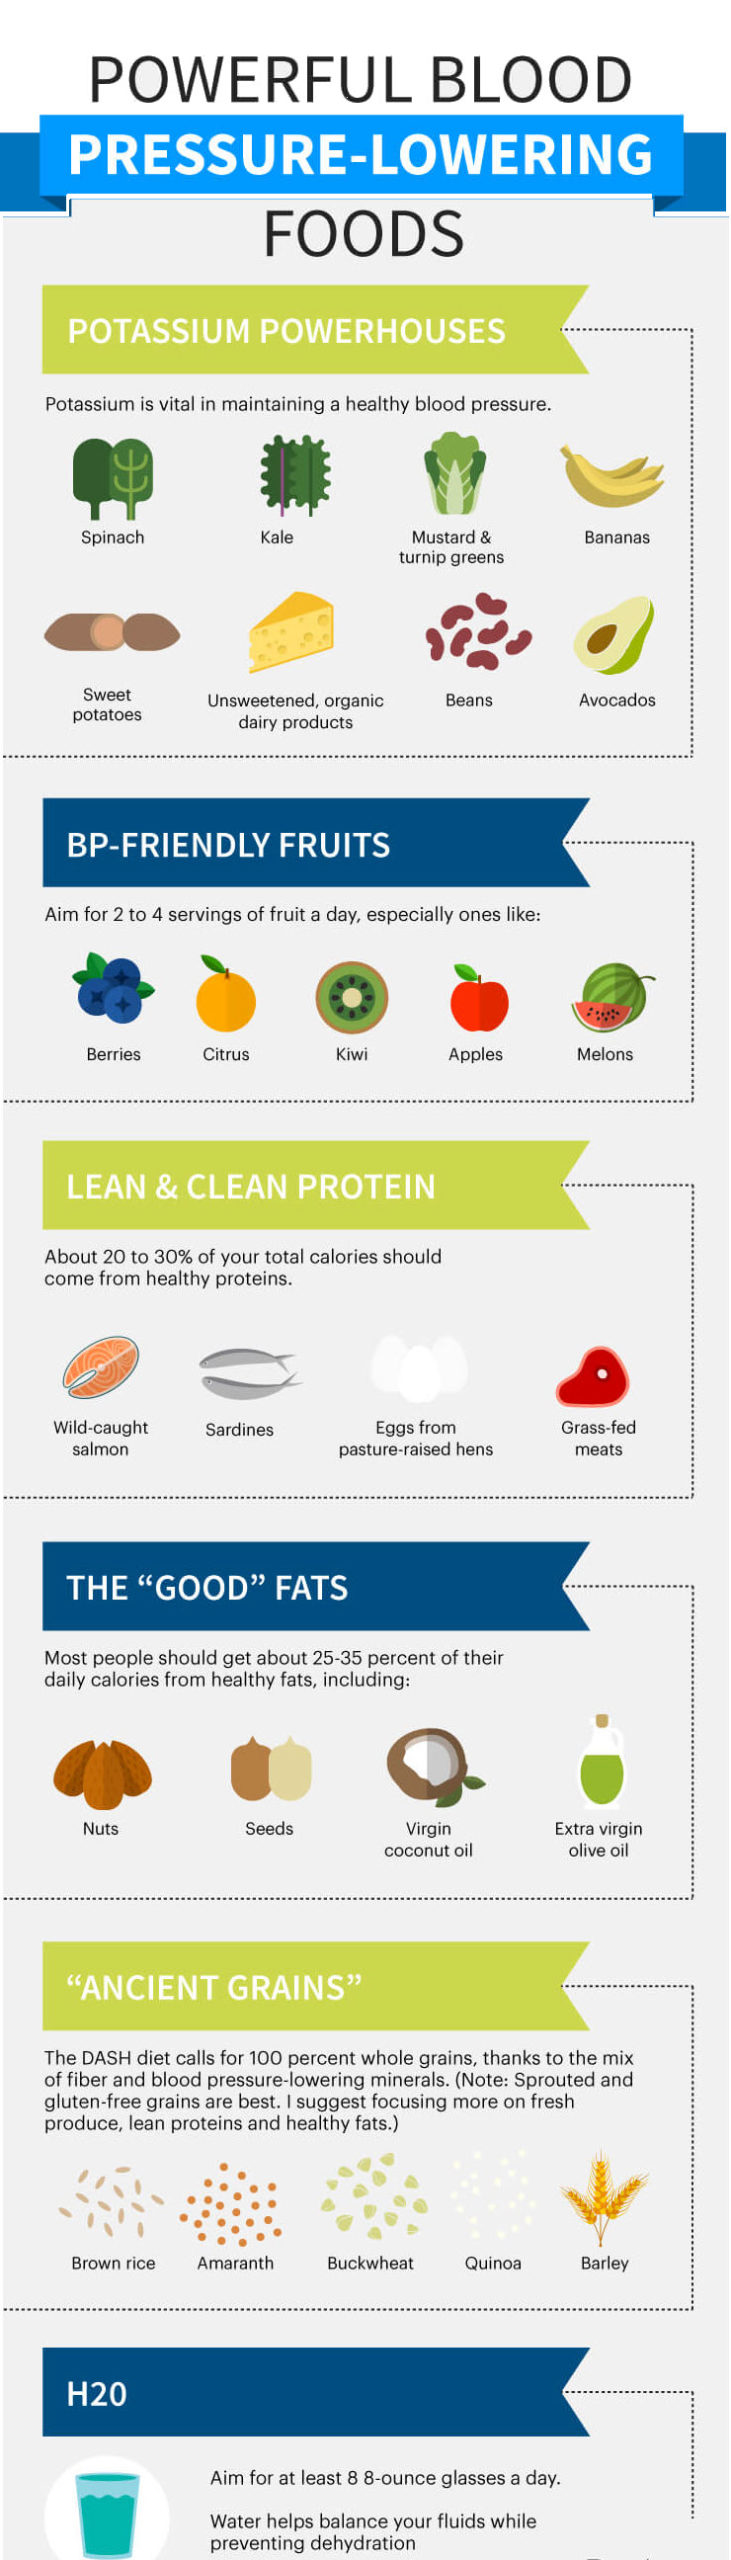 High blood pressure diet foods - MKexpress.net